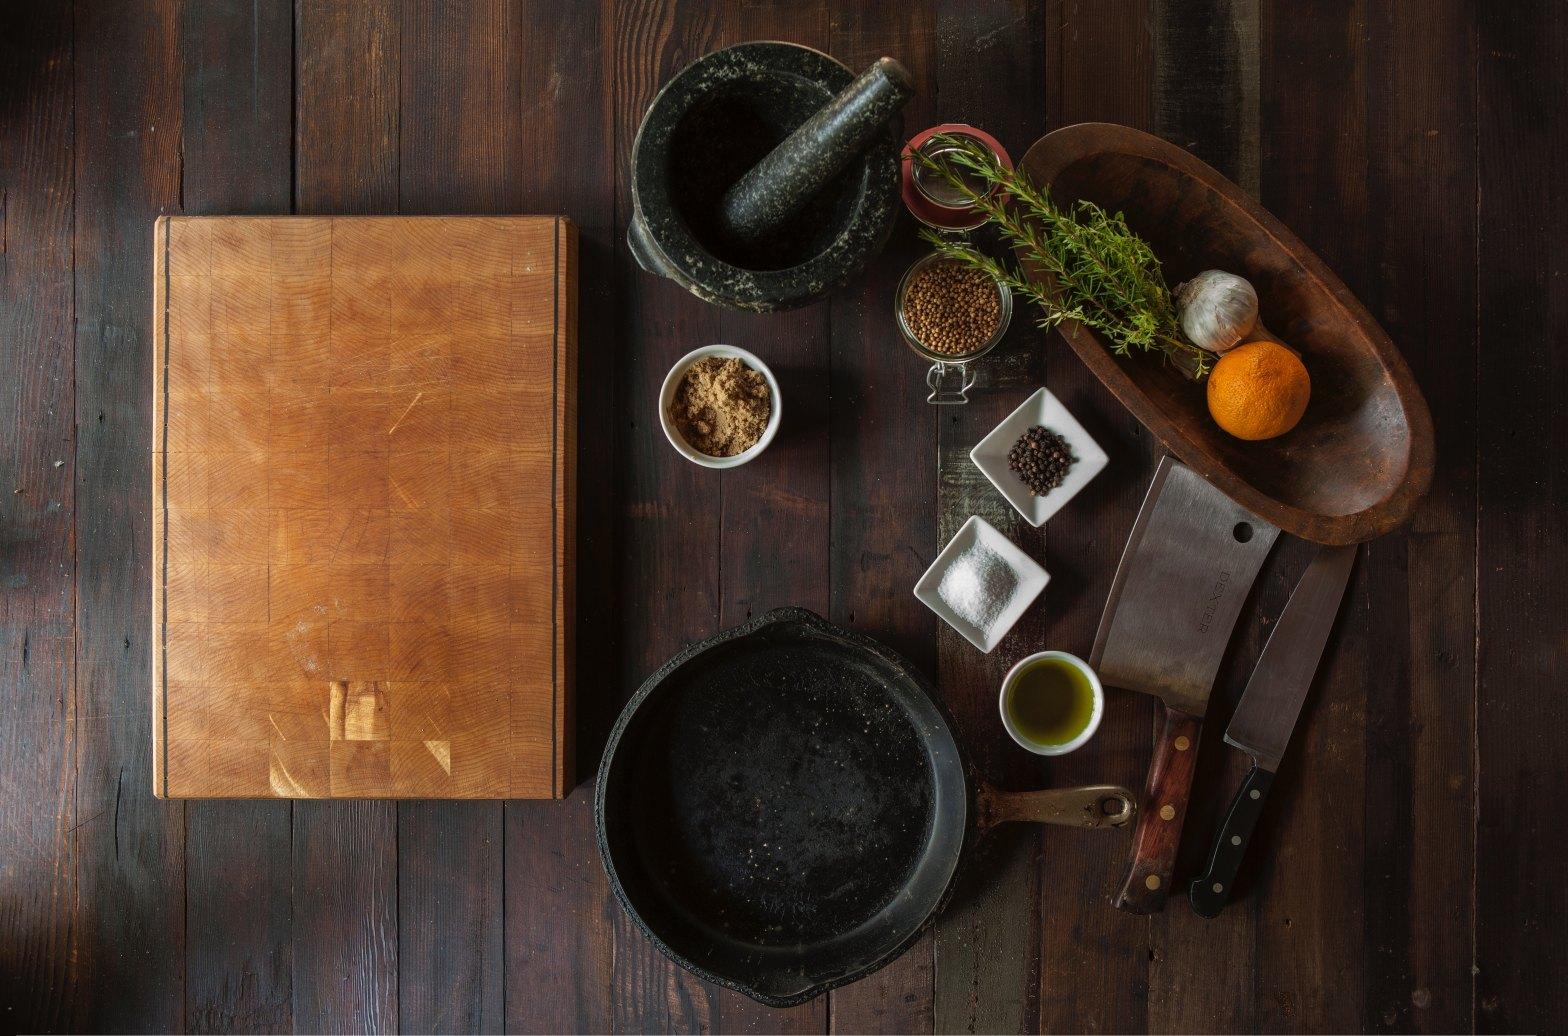 čišćenje i pohrana lignji